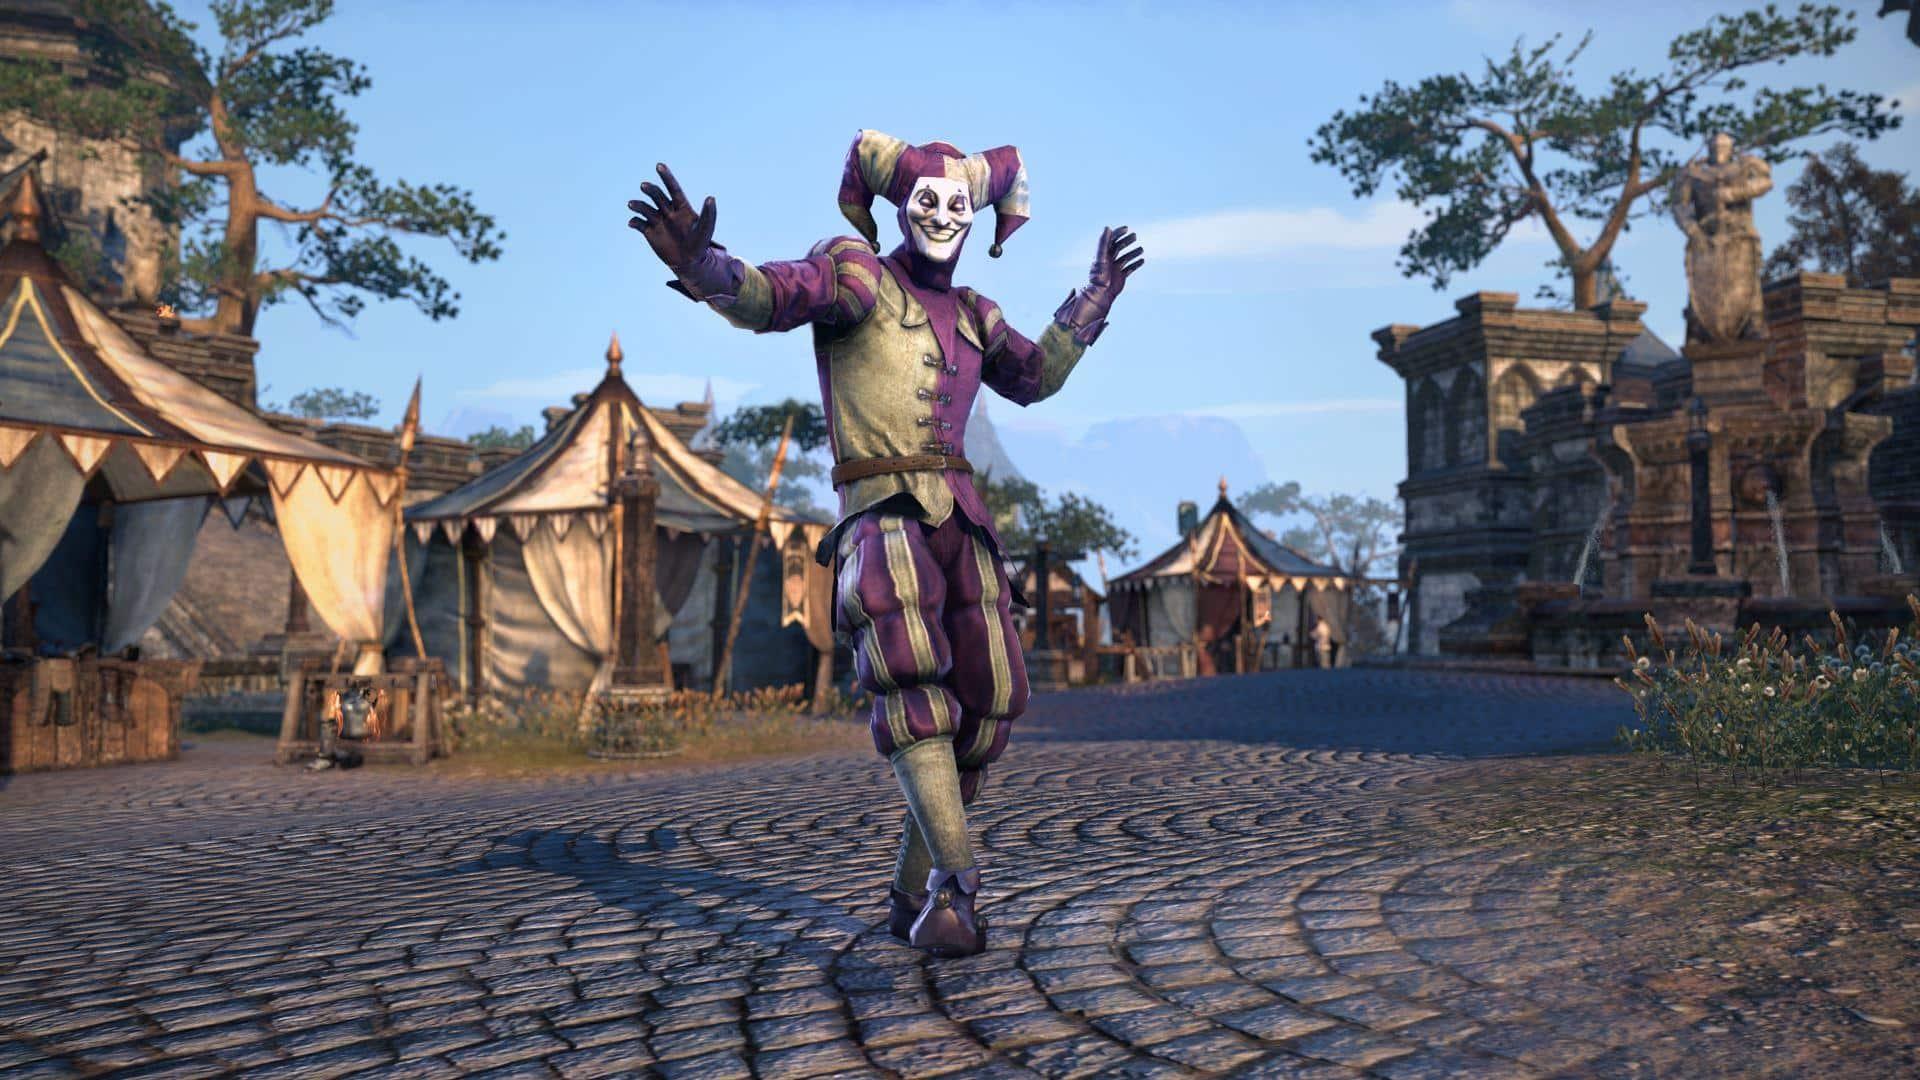 Enjoy Frivolous Fun During the Jester's Festival Event